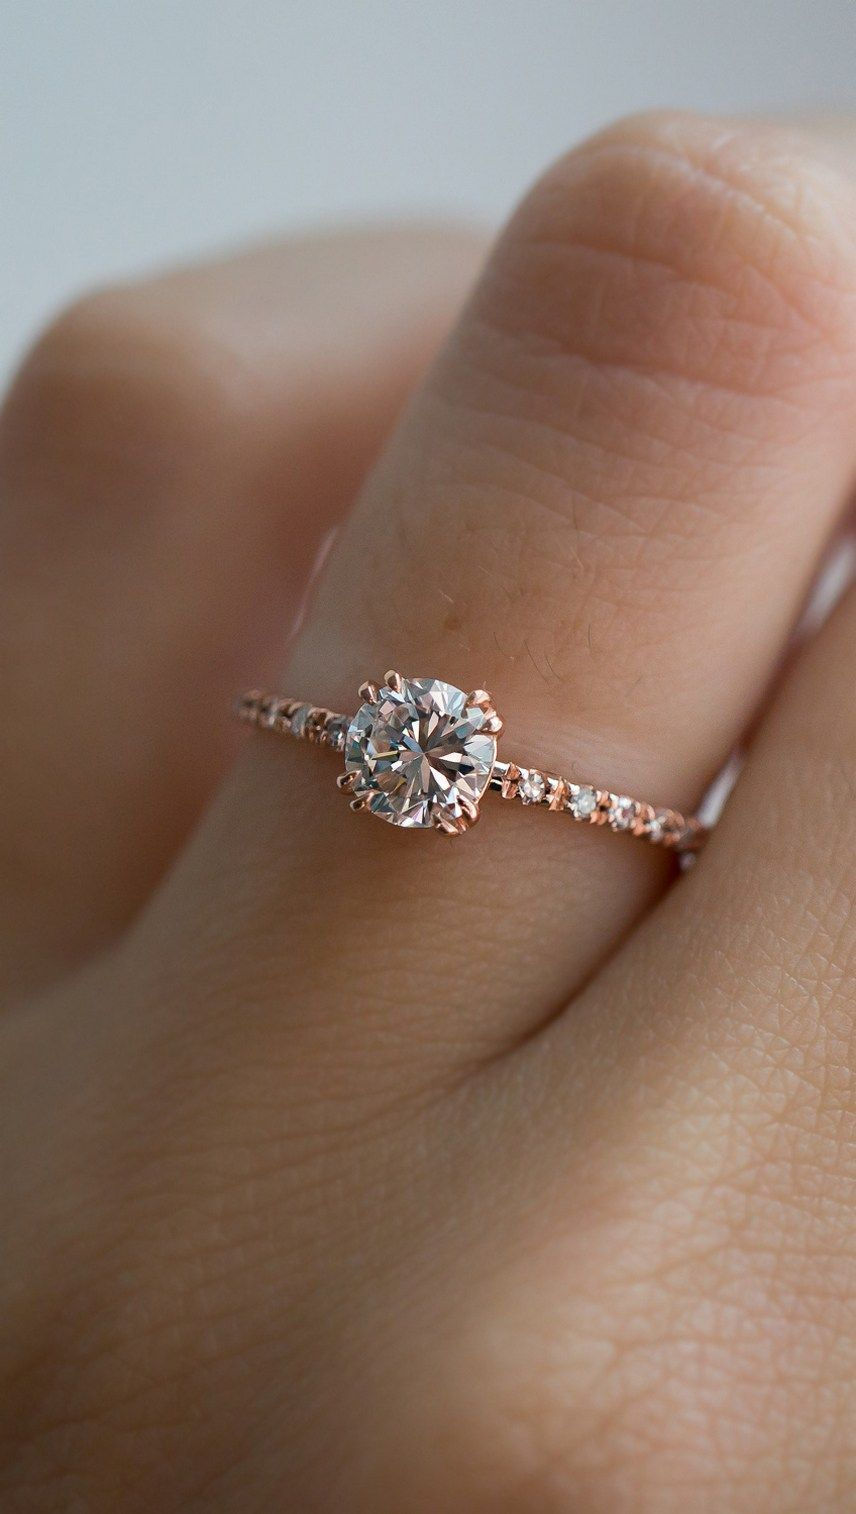 100 Simple Vintage Engagement Rings Inspiration 75 Engagement